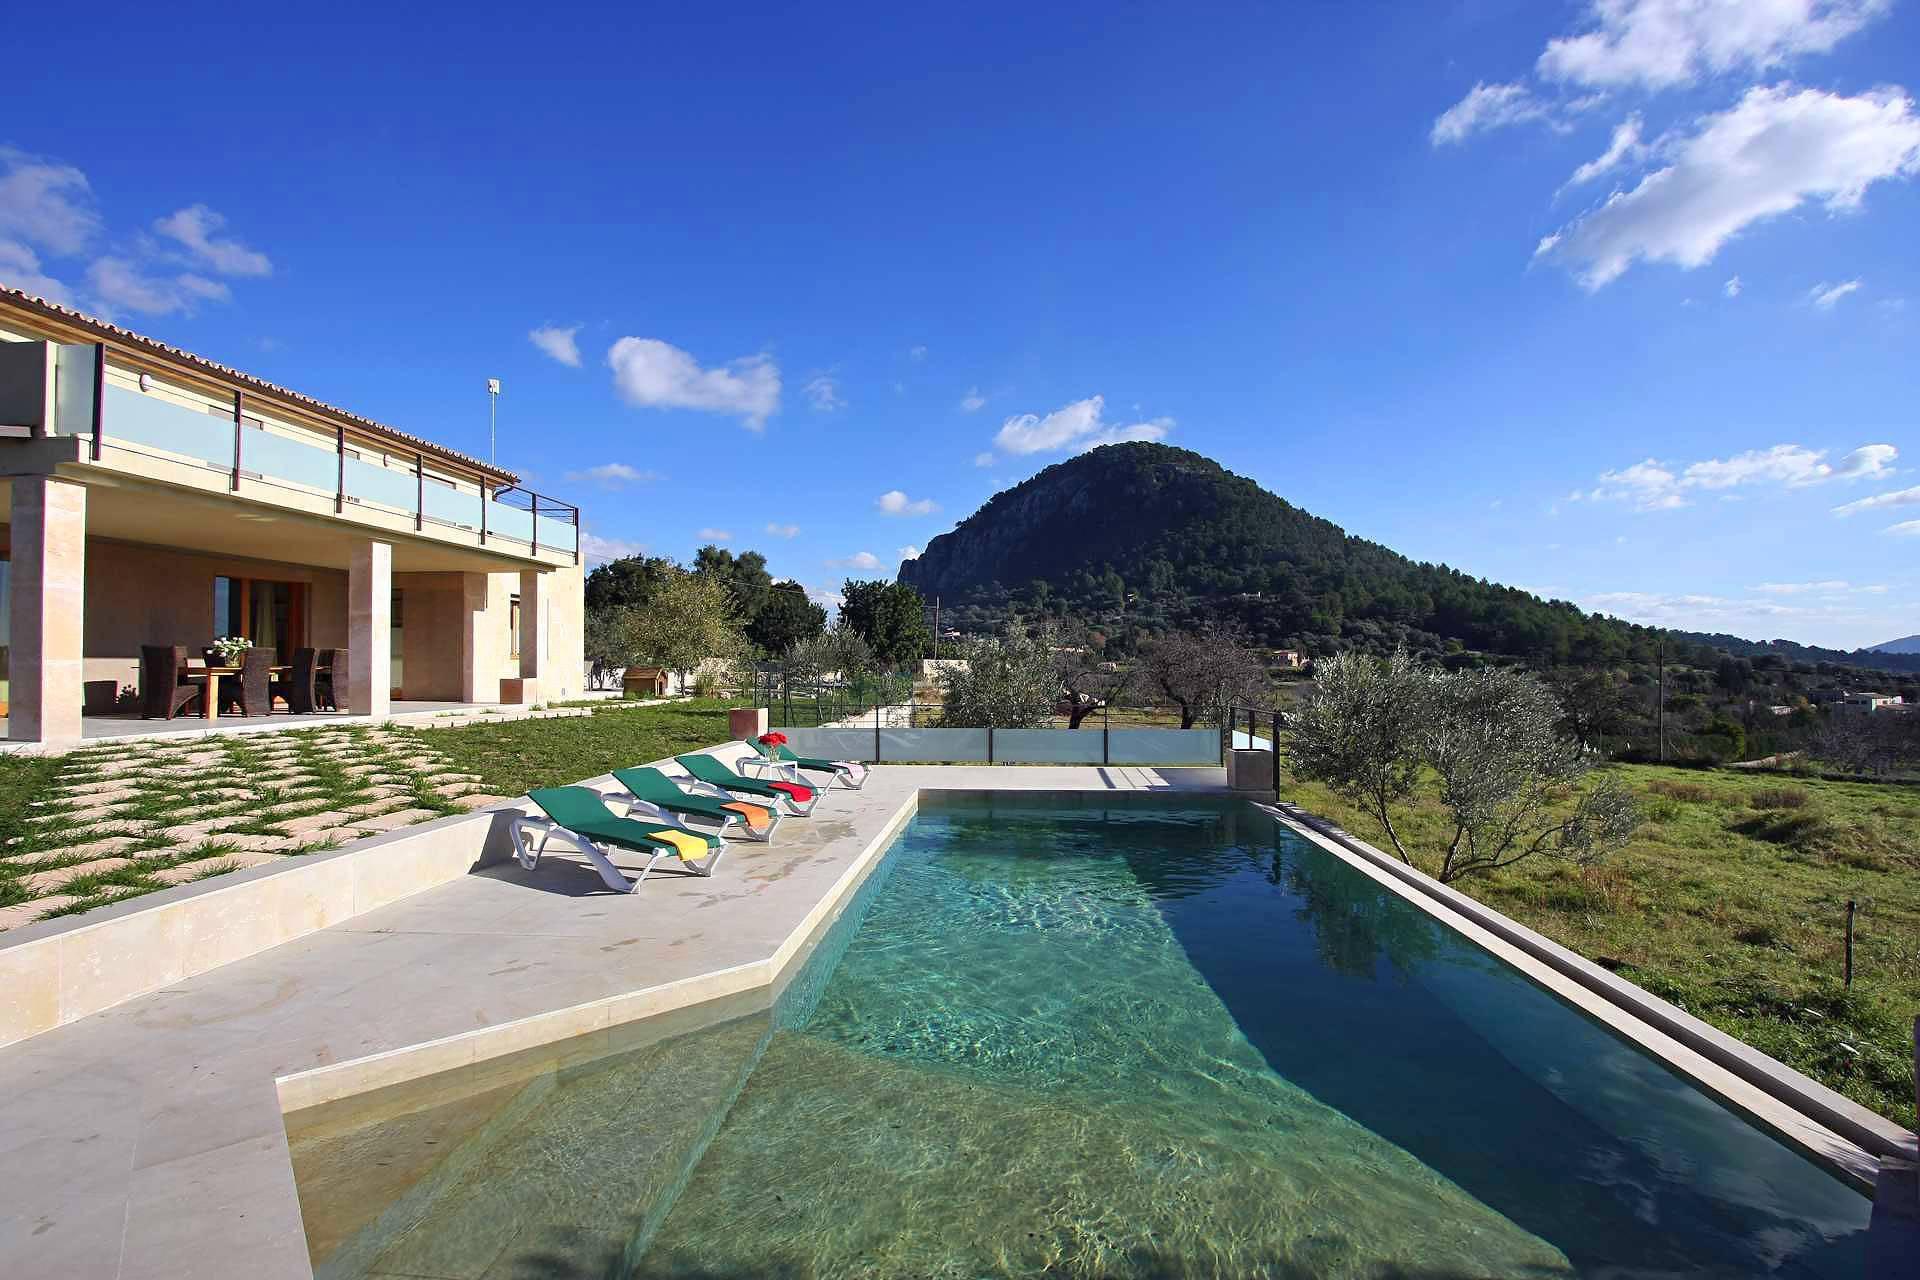 01-36 klassische Villa Mallorca Norden Bild 4